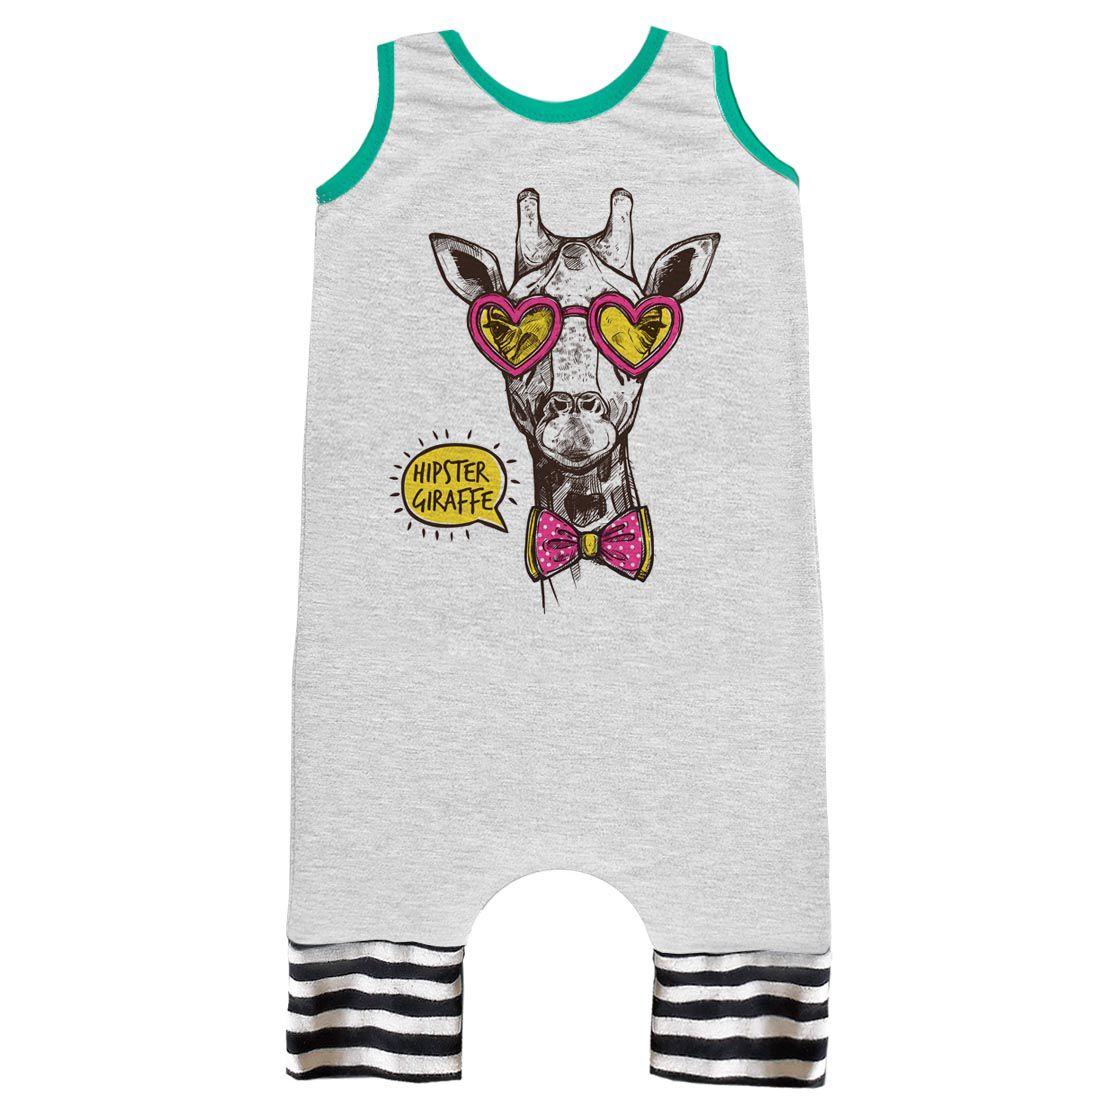 Pijama Regata Comfy Girafa